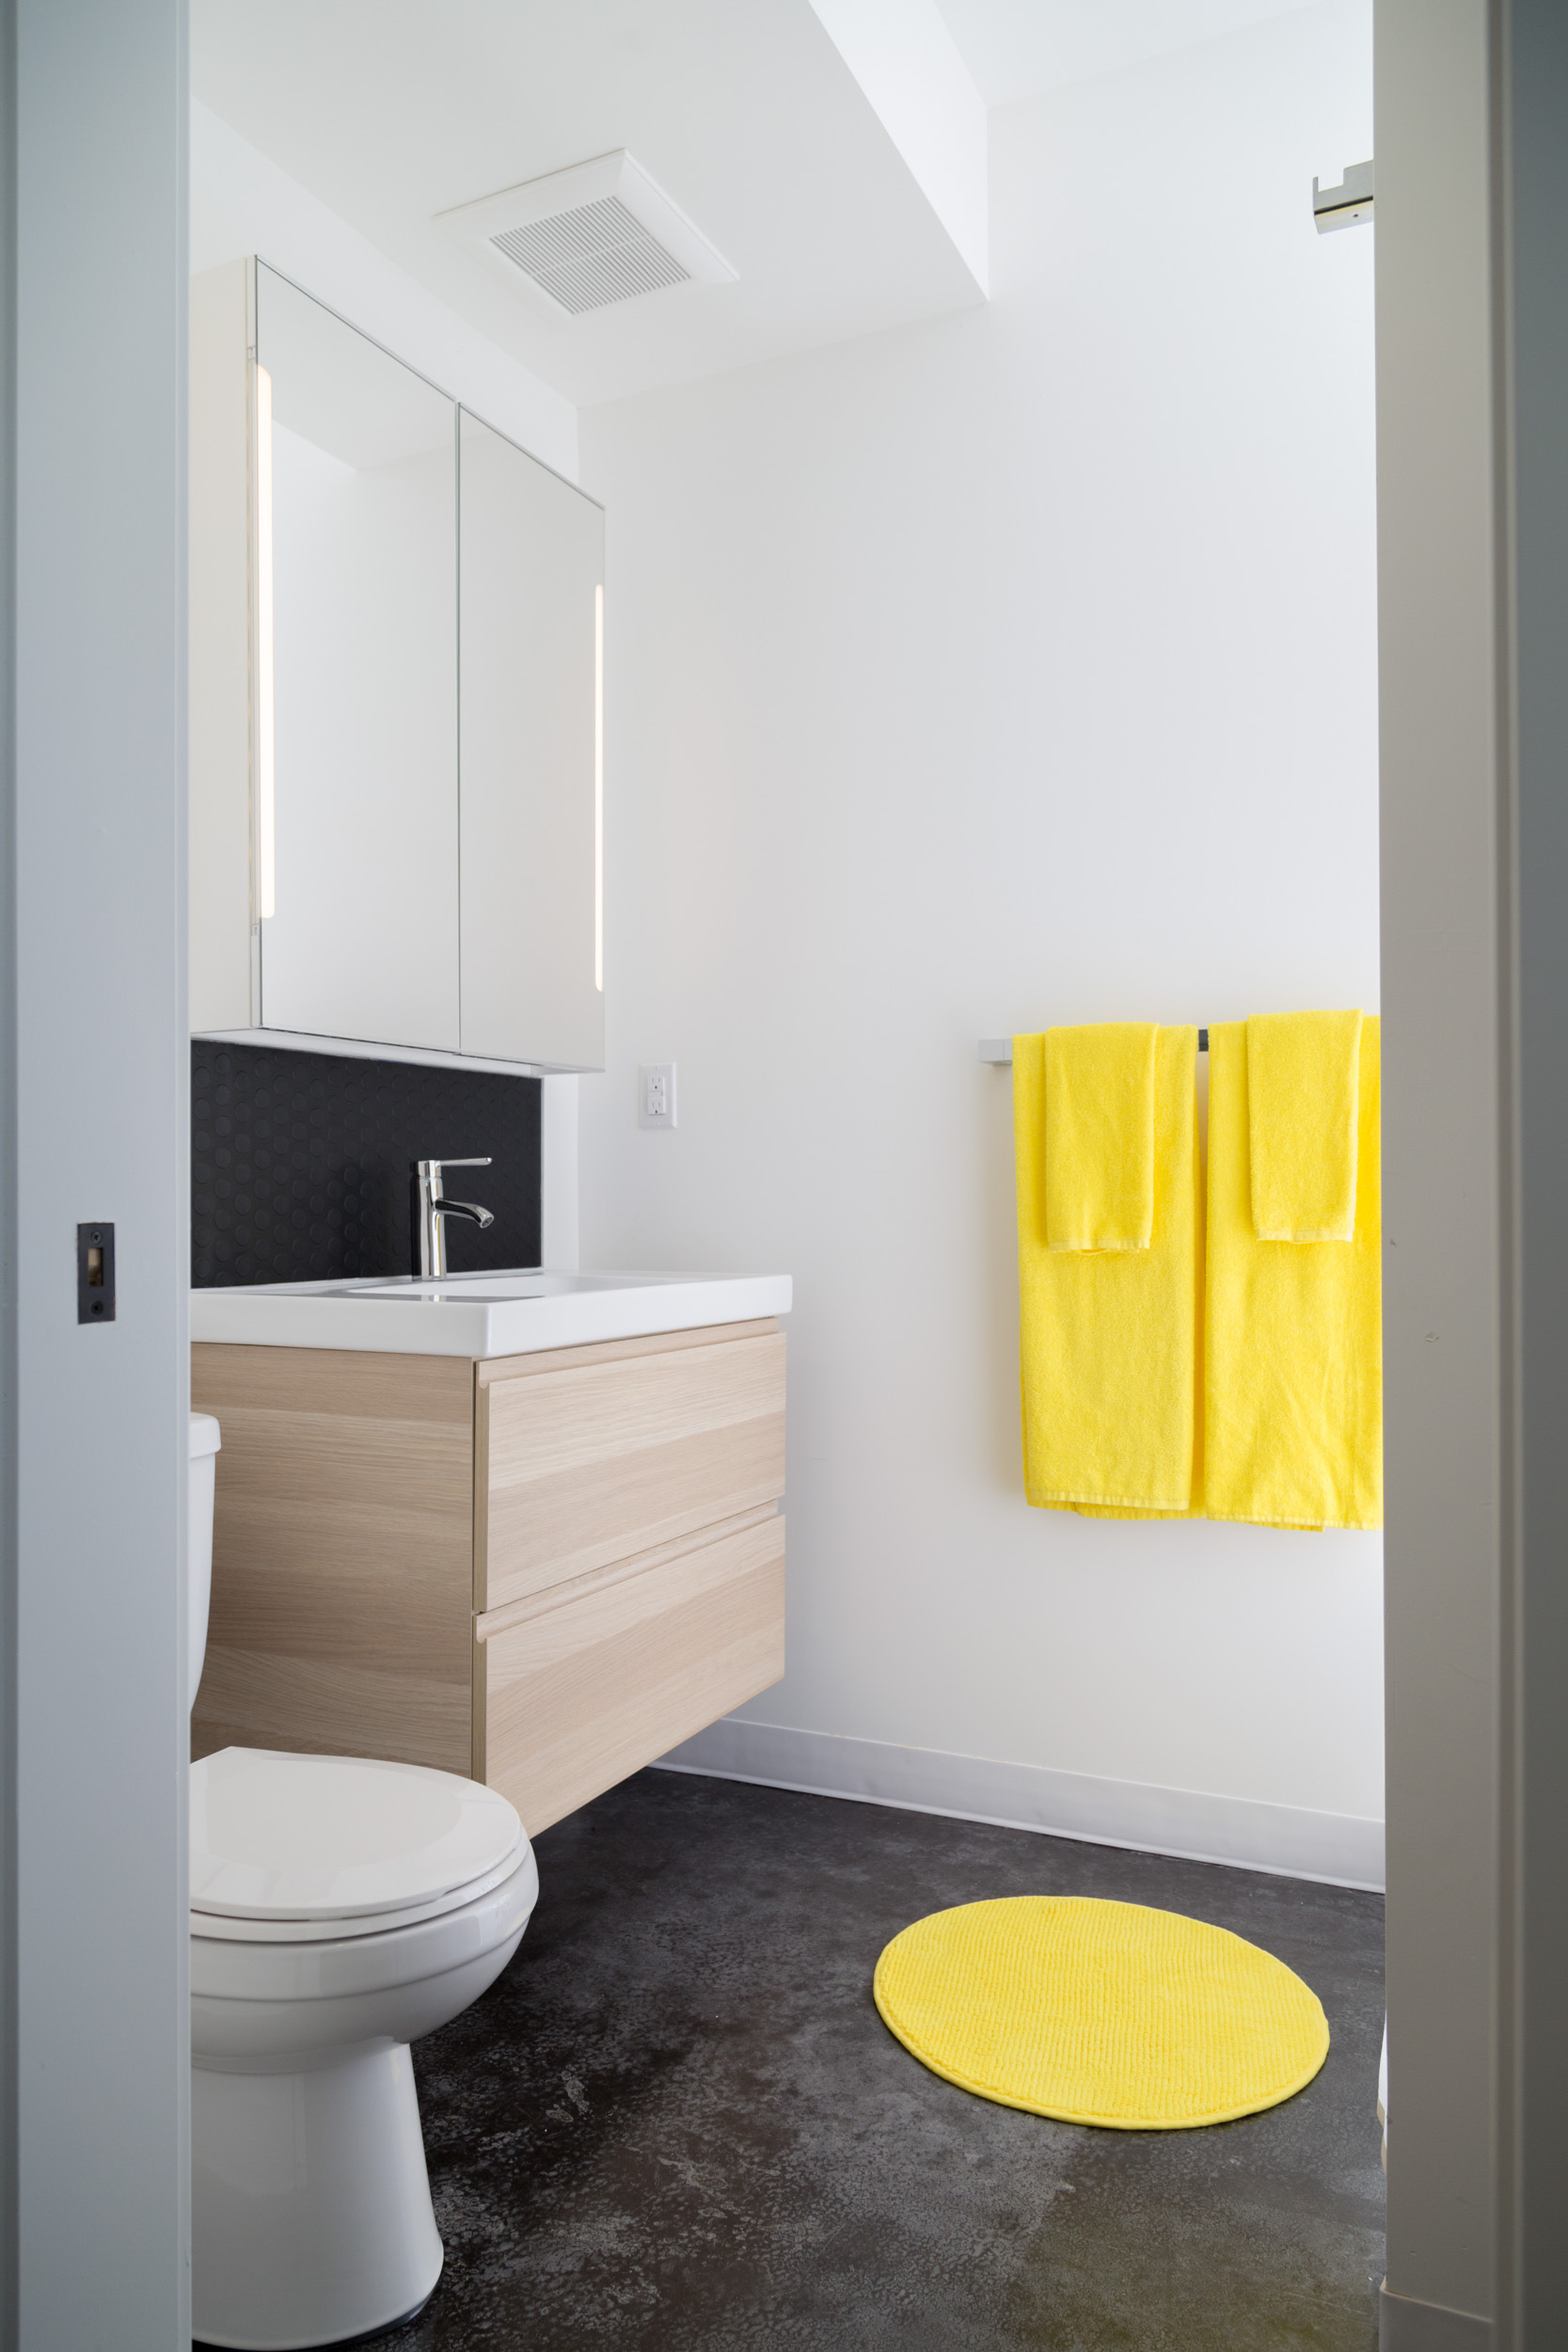 WC-STUDIO-PROSPECT-MINIMALIST-BATHROOM-CONCRETE-FLOOR-VANITY-LED-MIRRORED-MEDICINE-CABINET